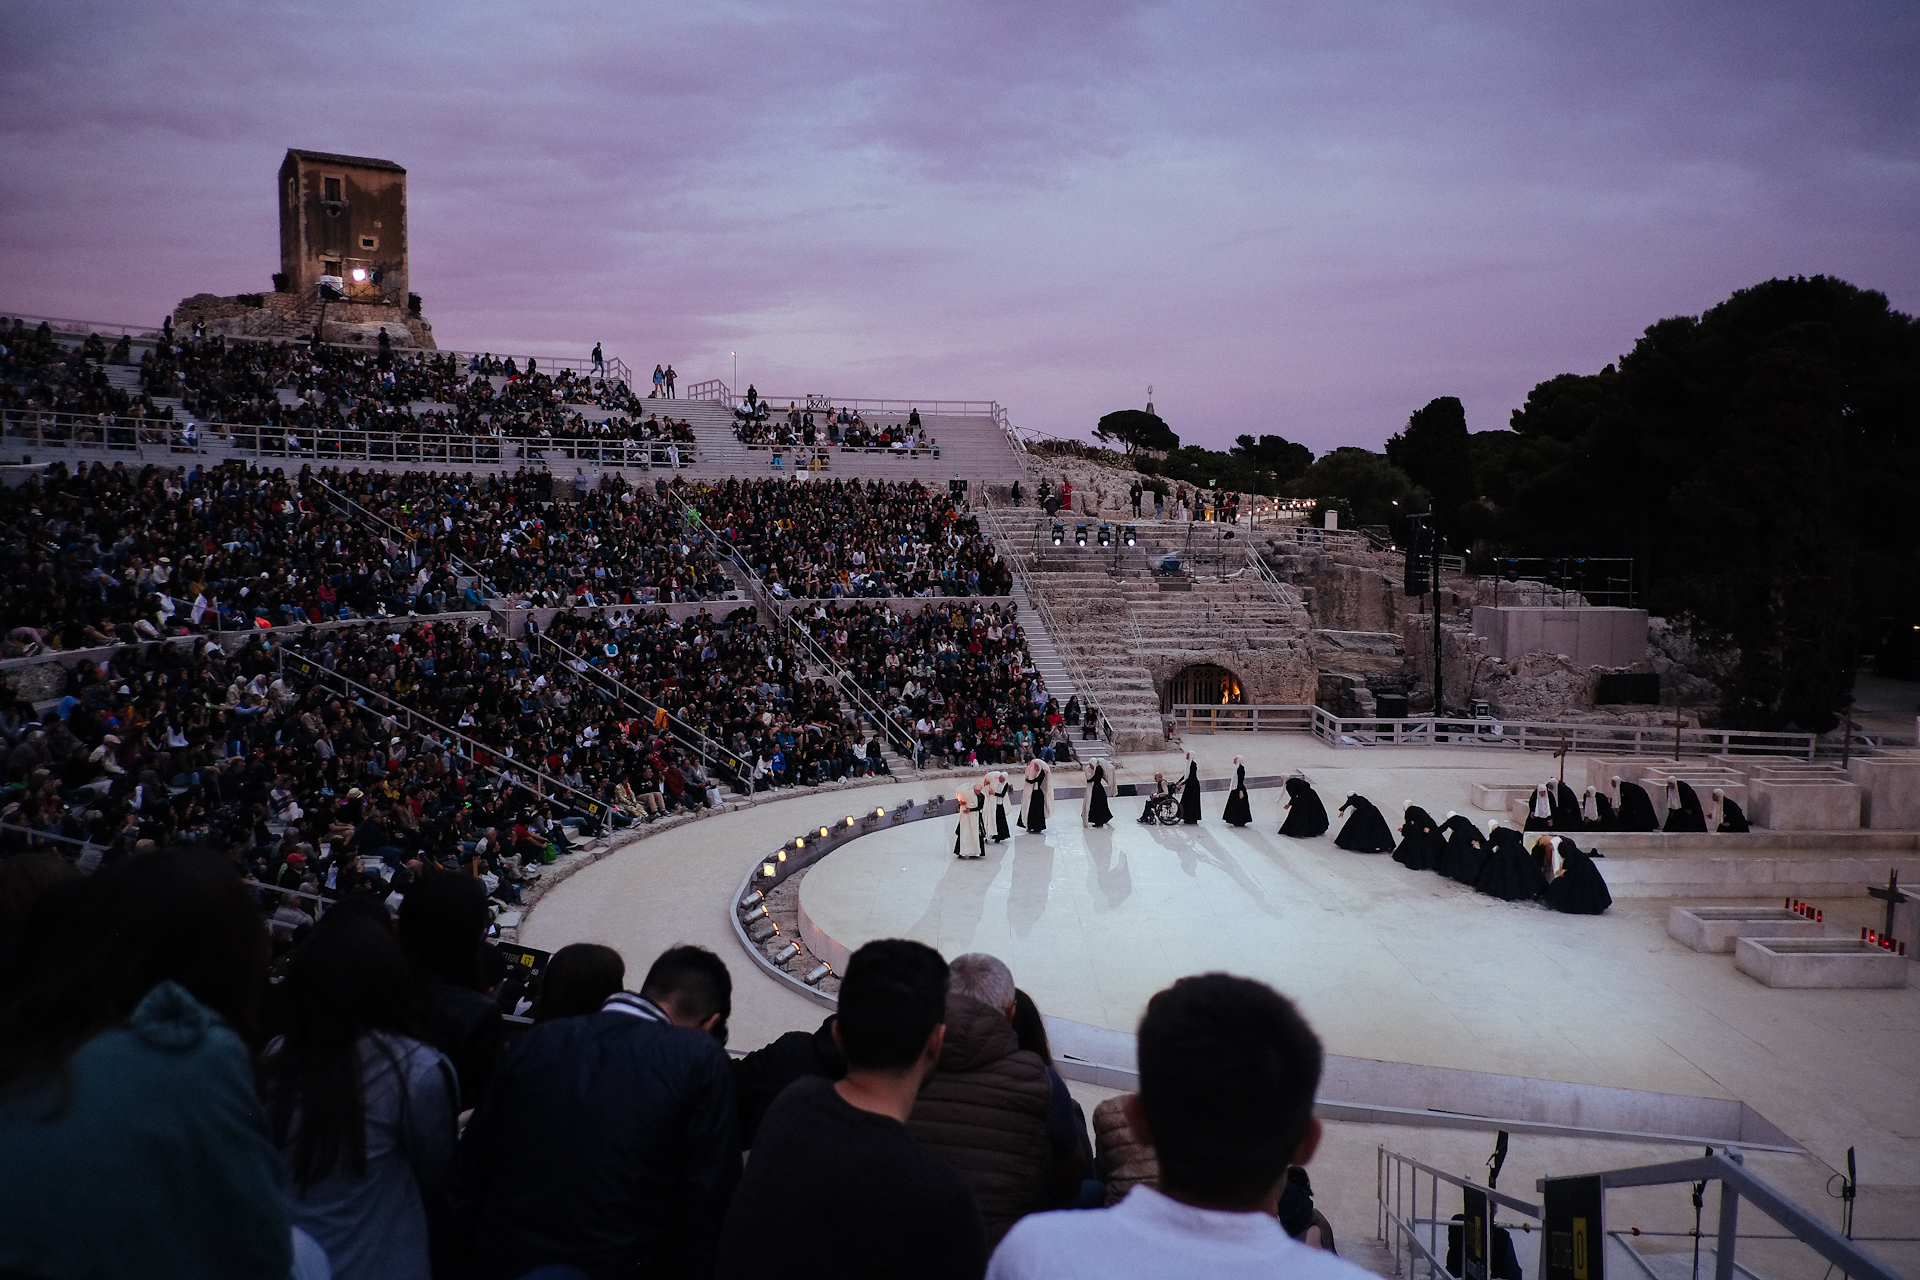 SICILY - Syrcuse/Ortigia